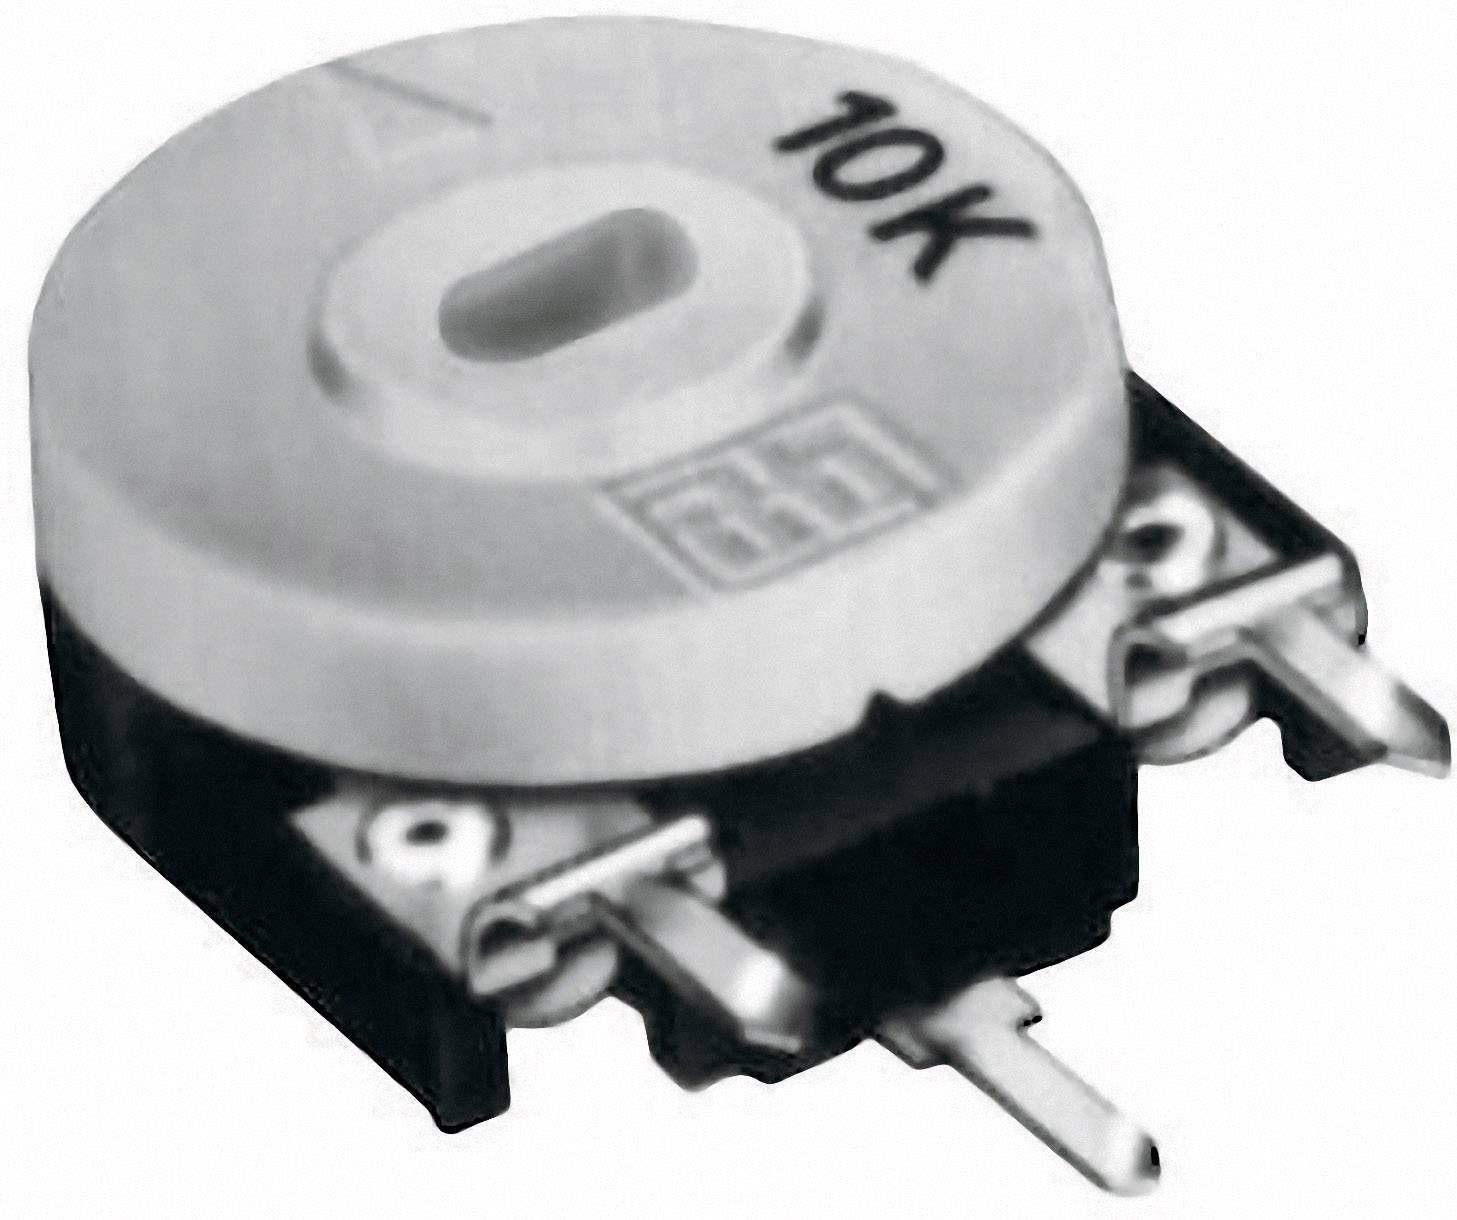 Uhlíkový trimer TT Electronics AB 21550005, lineárny, 100 Ohm, 0.15 W, 1 ks